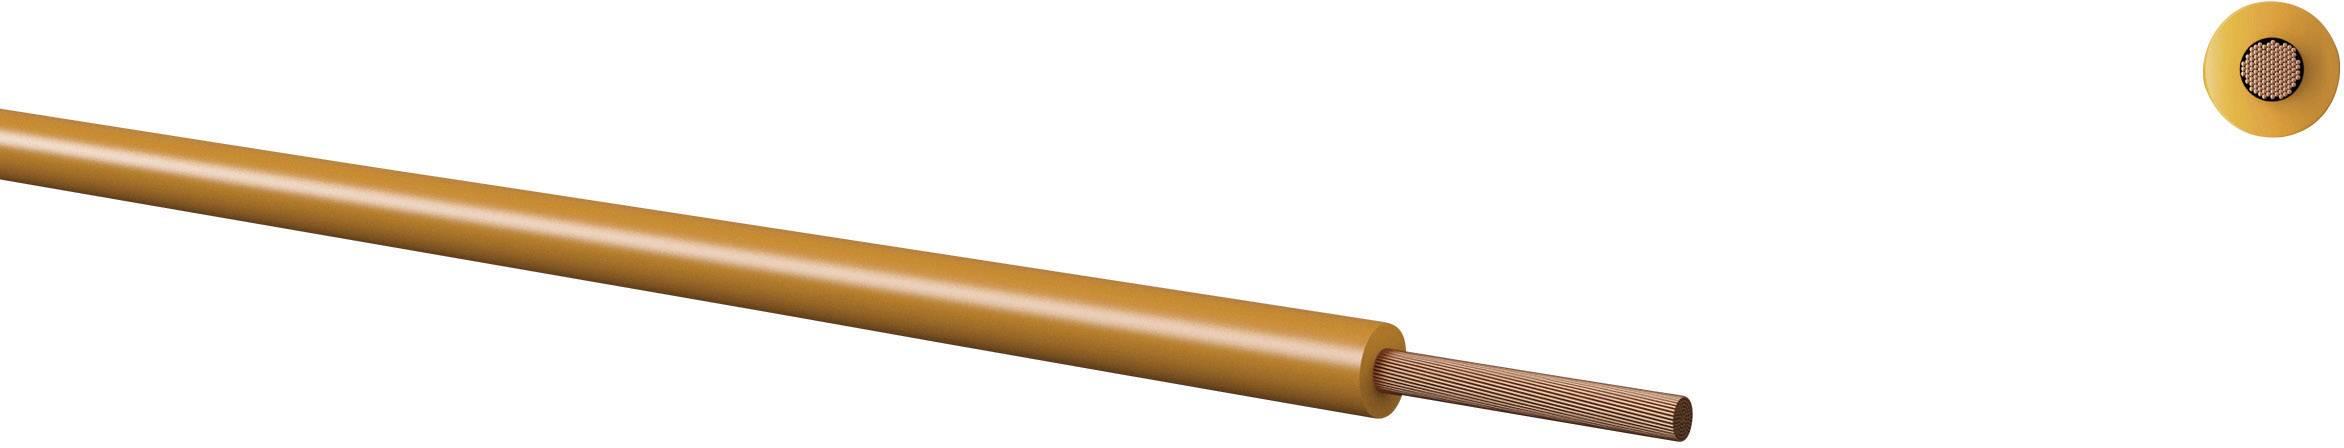 Pletenica LiFY 1 x 2.50 mm, siva Kabeltronik 160125005 cena za meter